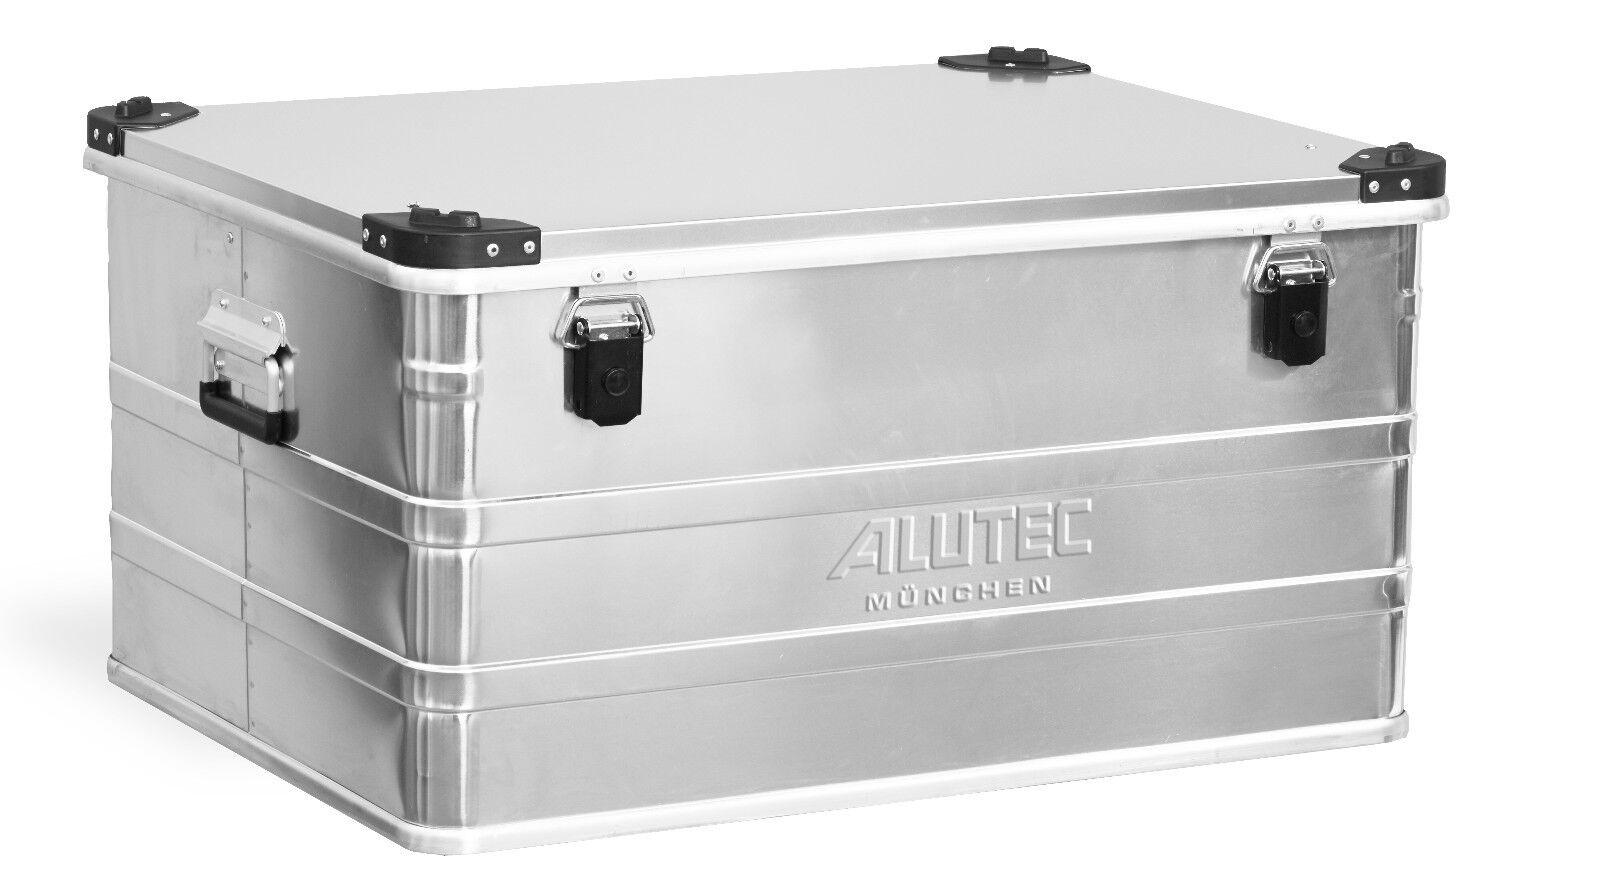 Aluminiumbox Aluminiumbox Aluminiumbox NEU mit Schaumstoffverkleidung D157 Alutec Zarges Wekzeugbox Lager     | Viele Sorten  128174